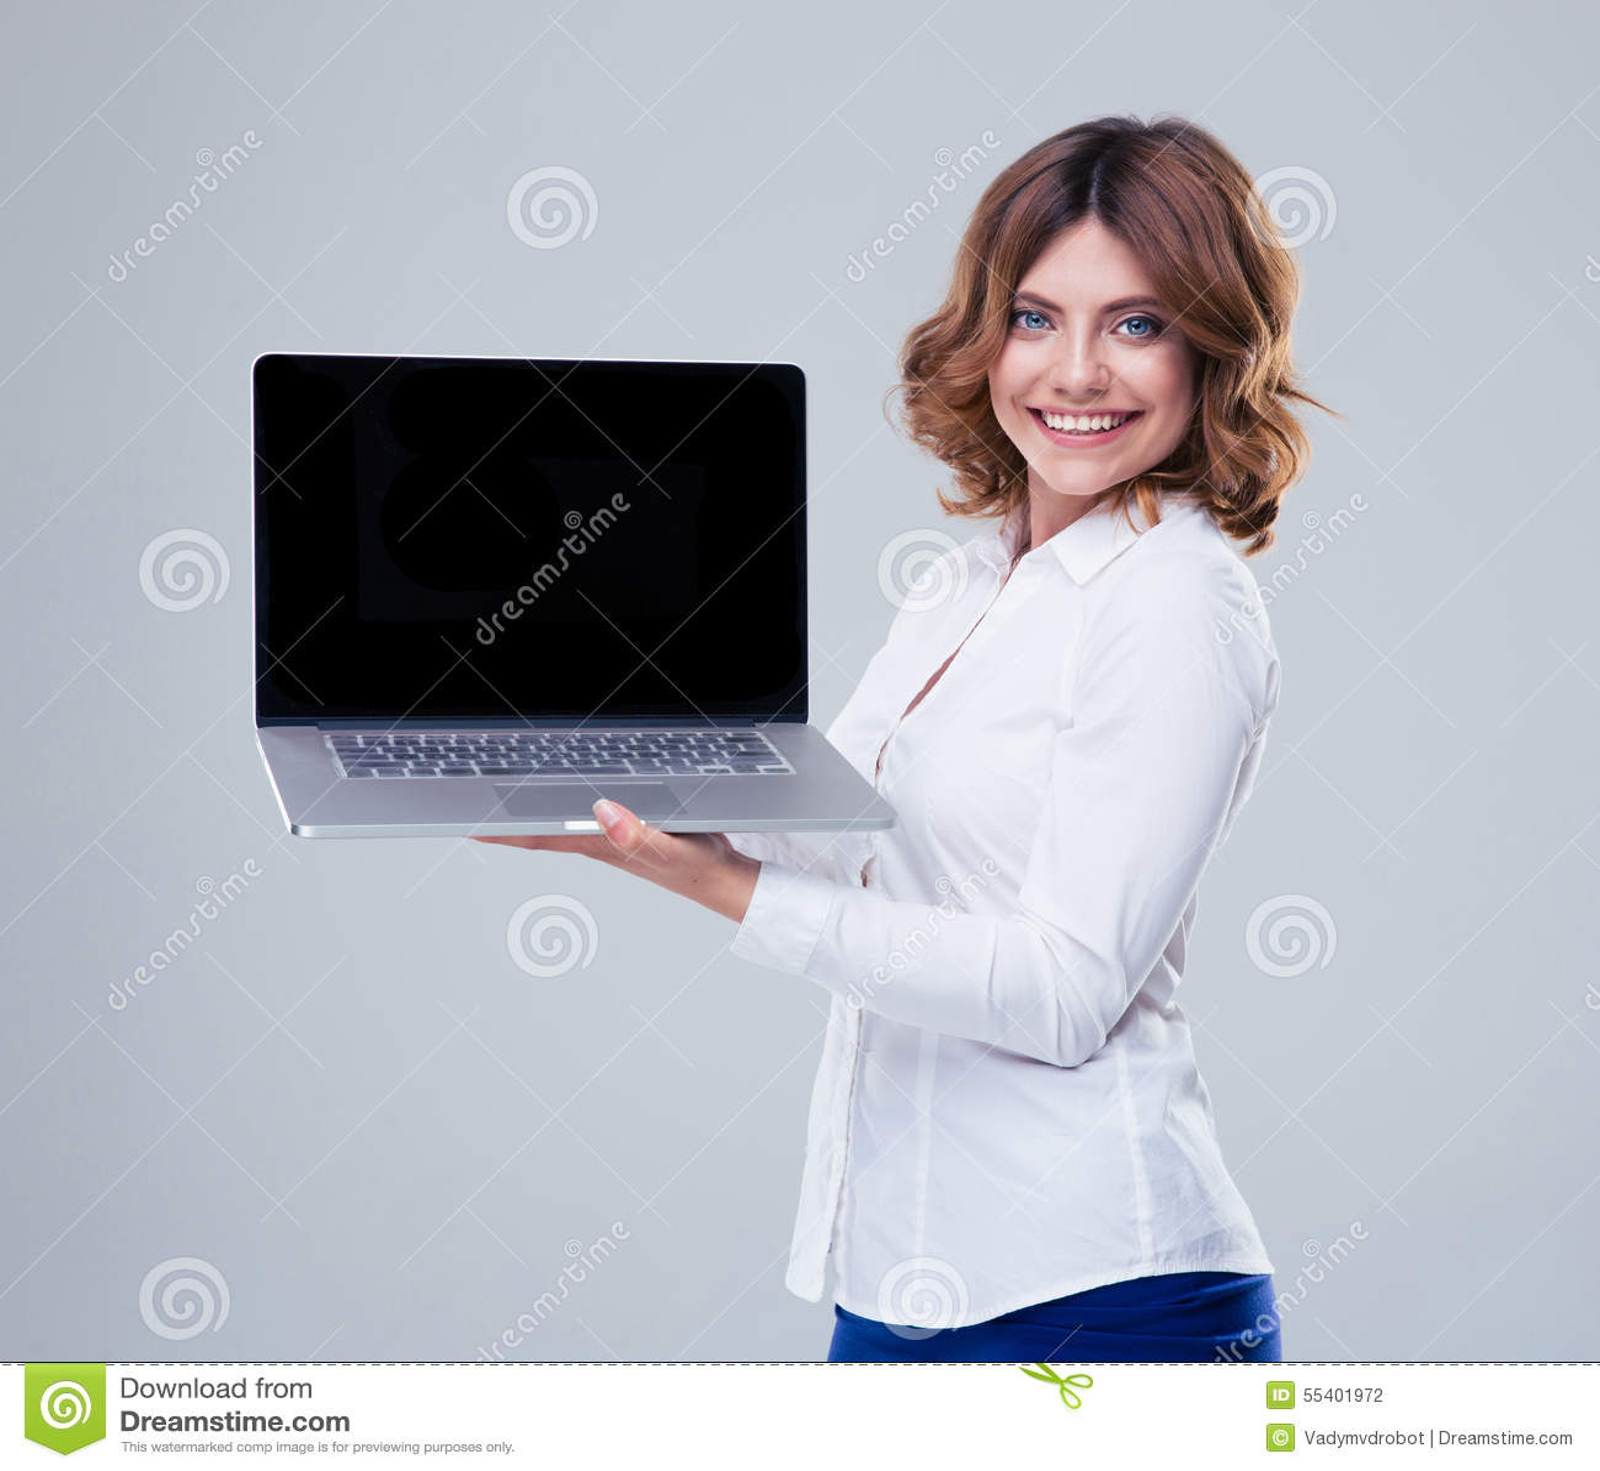 Happy businesswoman showing laptop screen